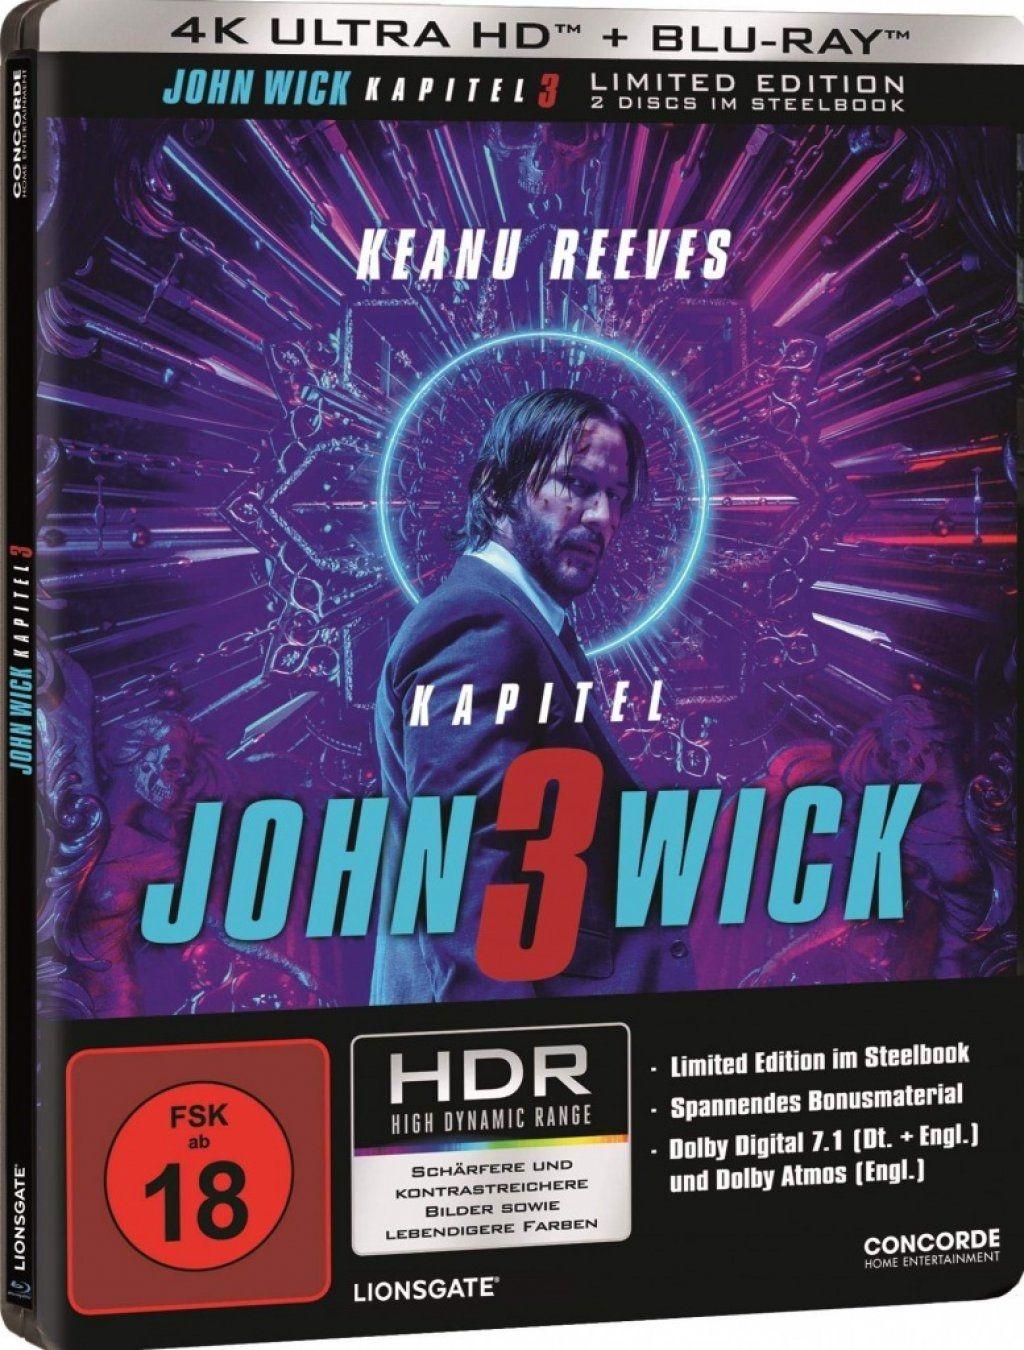 John Wick: Kapitel 3 (Lim. Steelbook) (2 Discs) (UHD BLURAY + BLURAY)